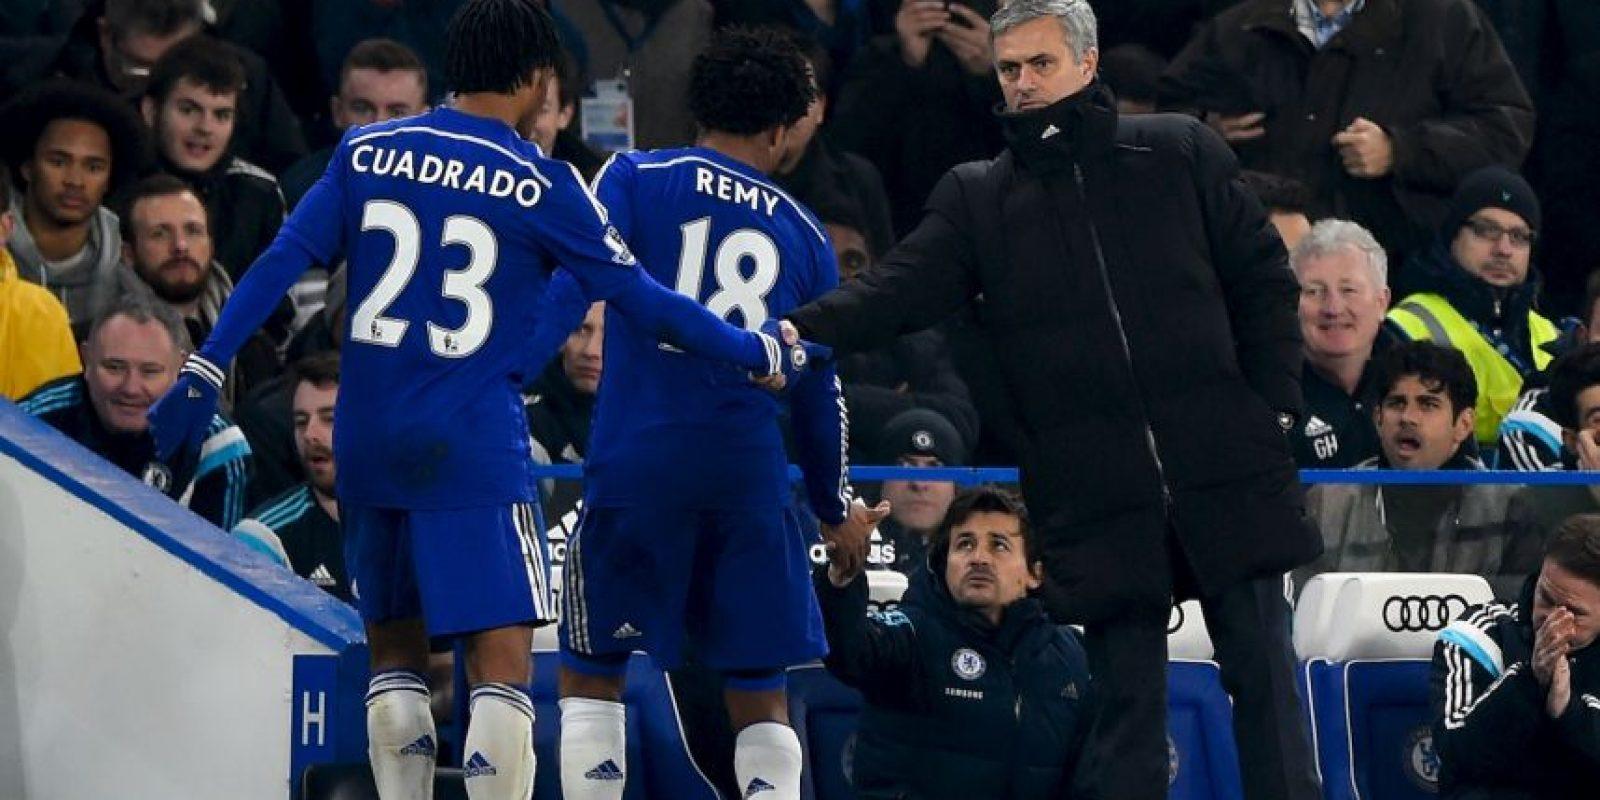 Mou tiene al Chelsea en la cima de la Premier League Foto:Getty